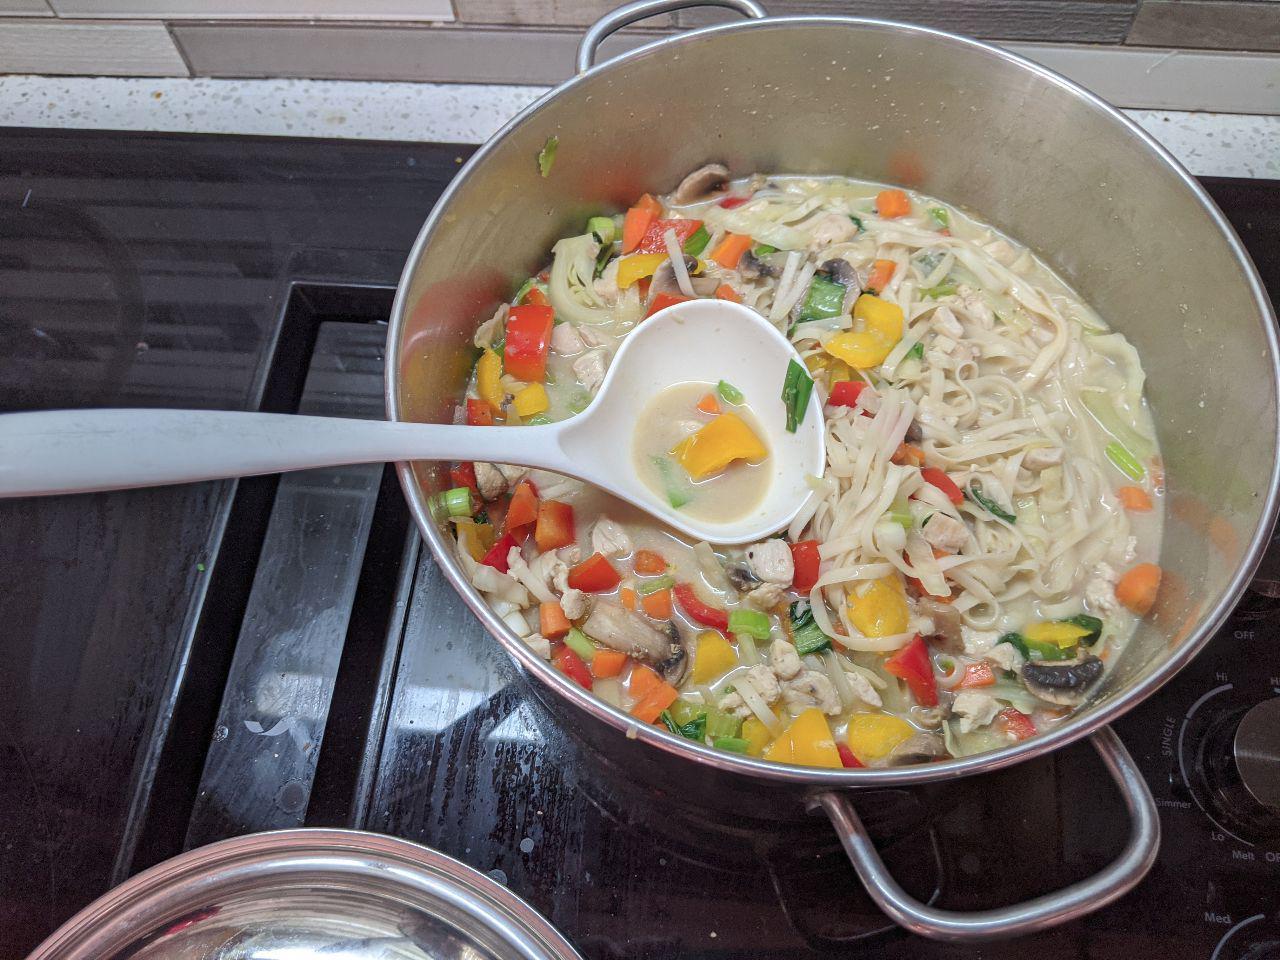 toru yano curry round 2 big pot